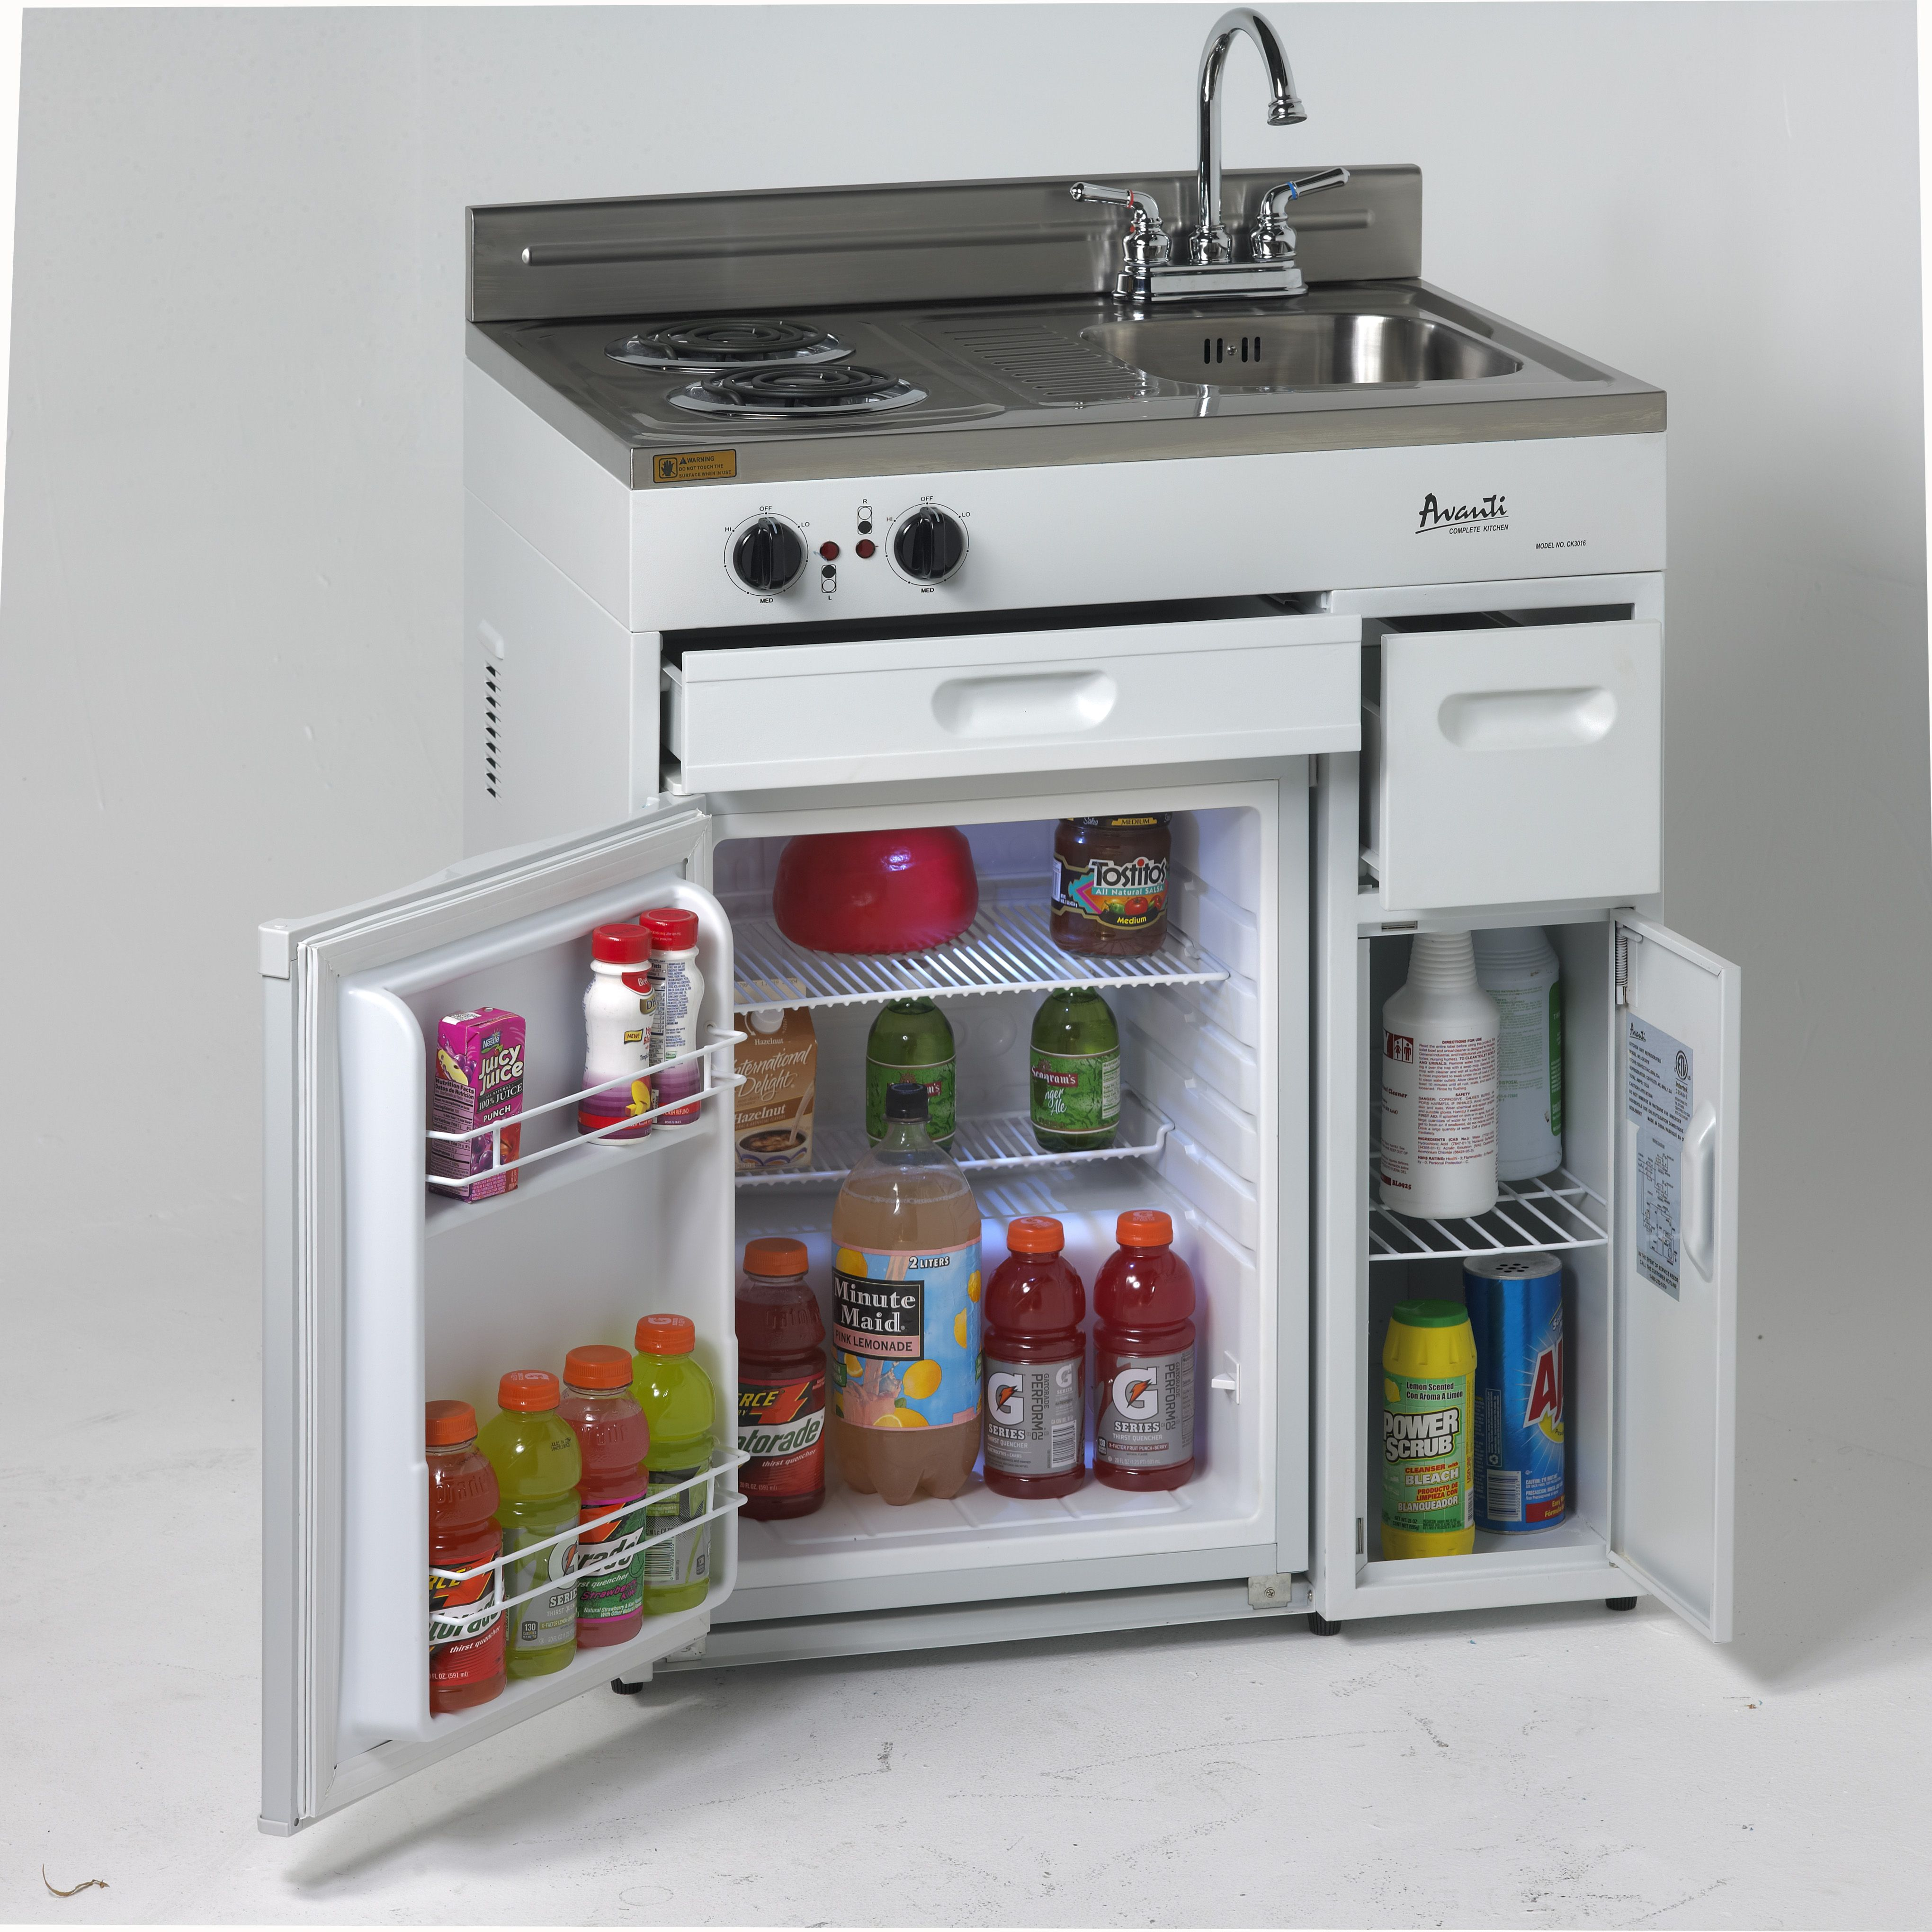 Buy Avanti CK3016 30 inch Complete Compact Kitchen 2.2